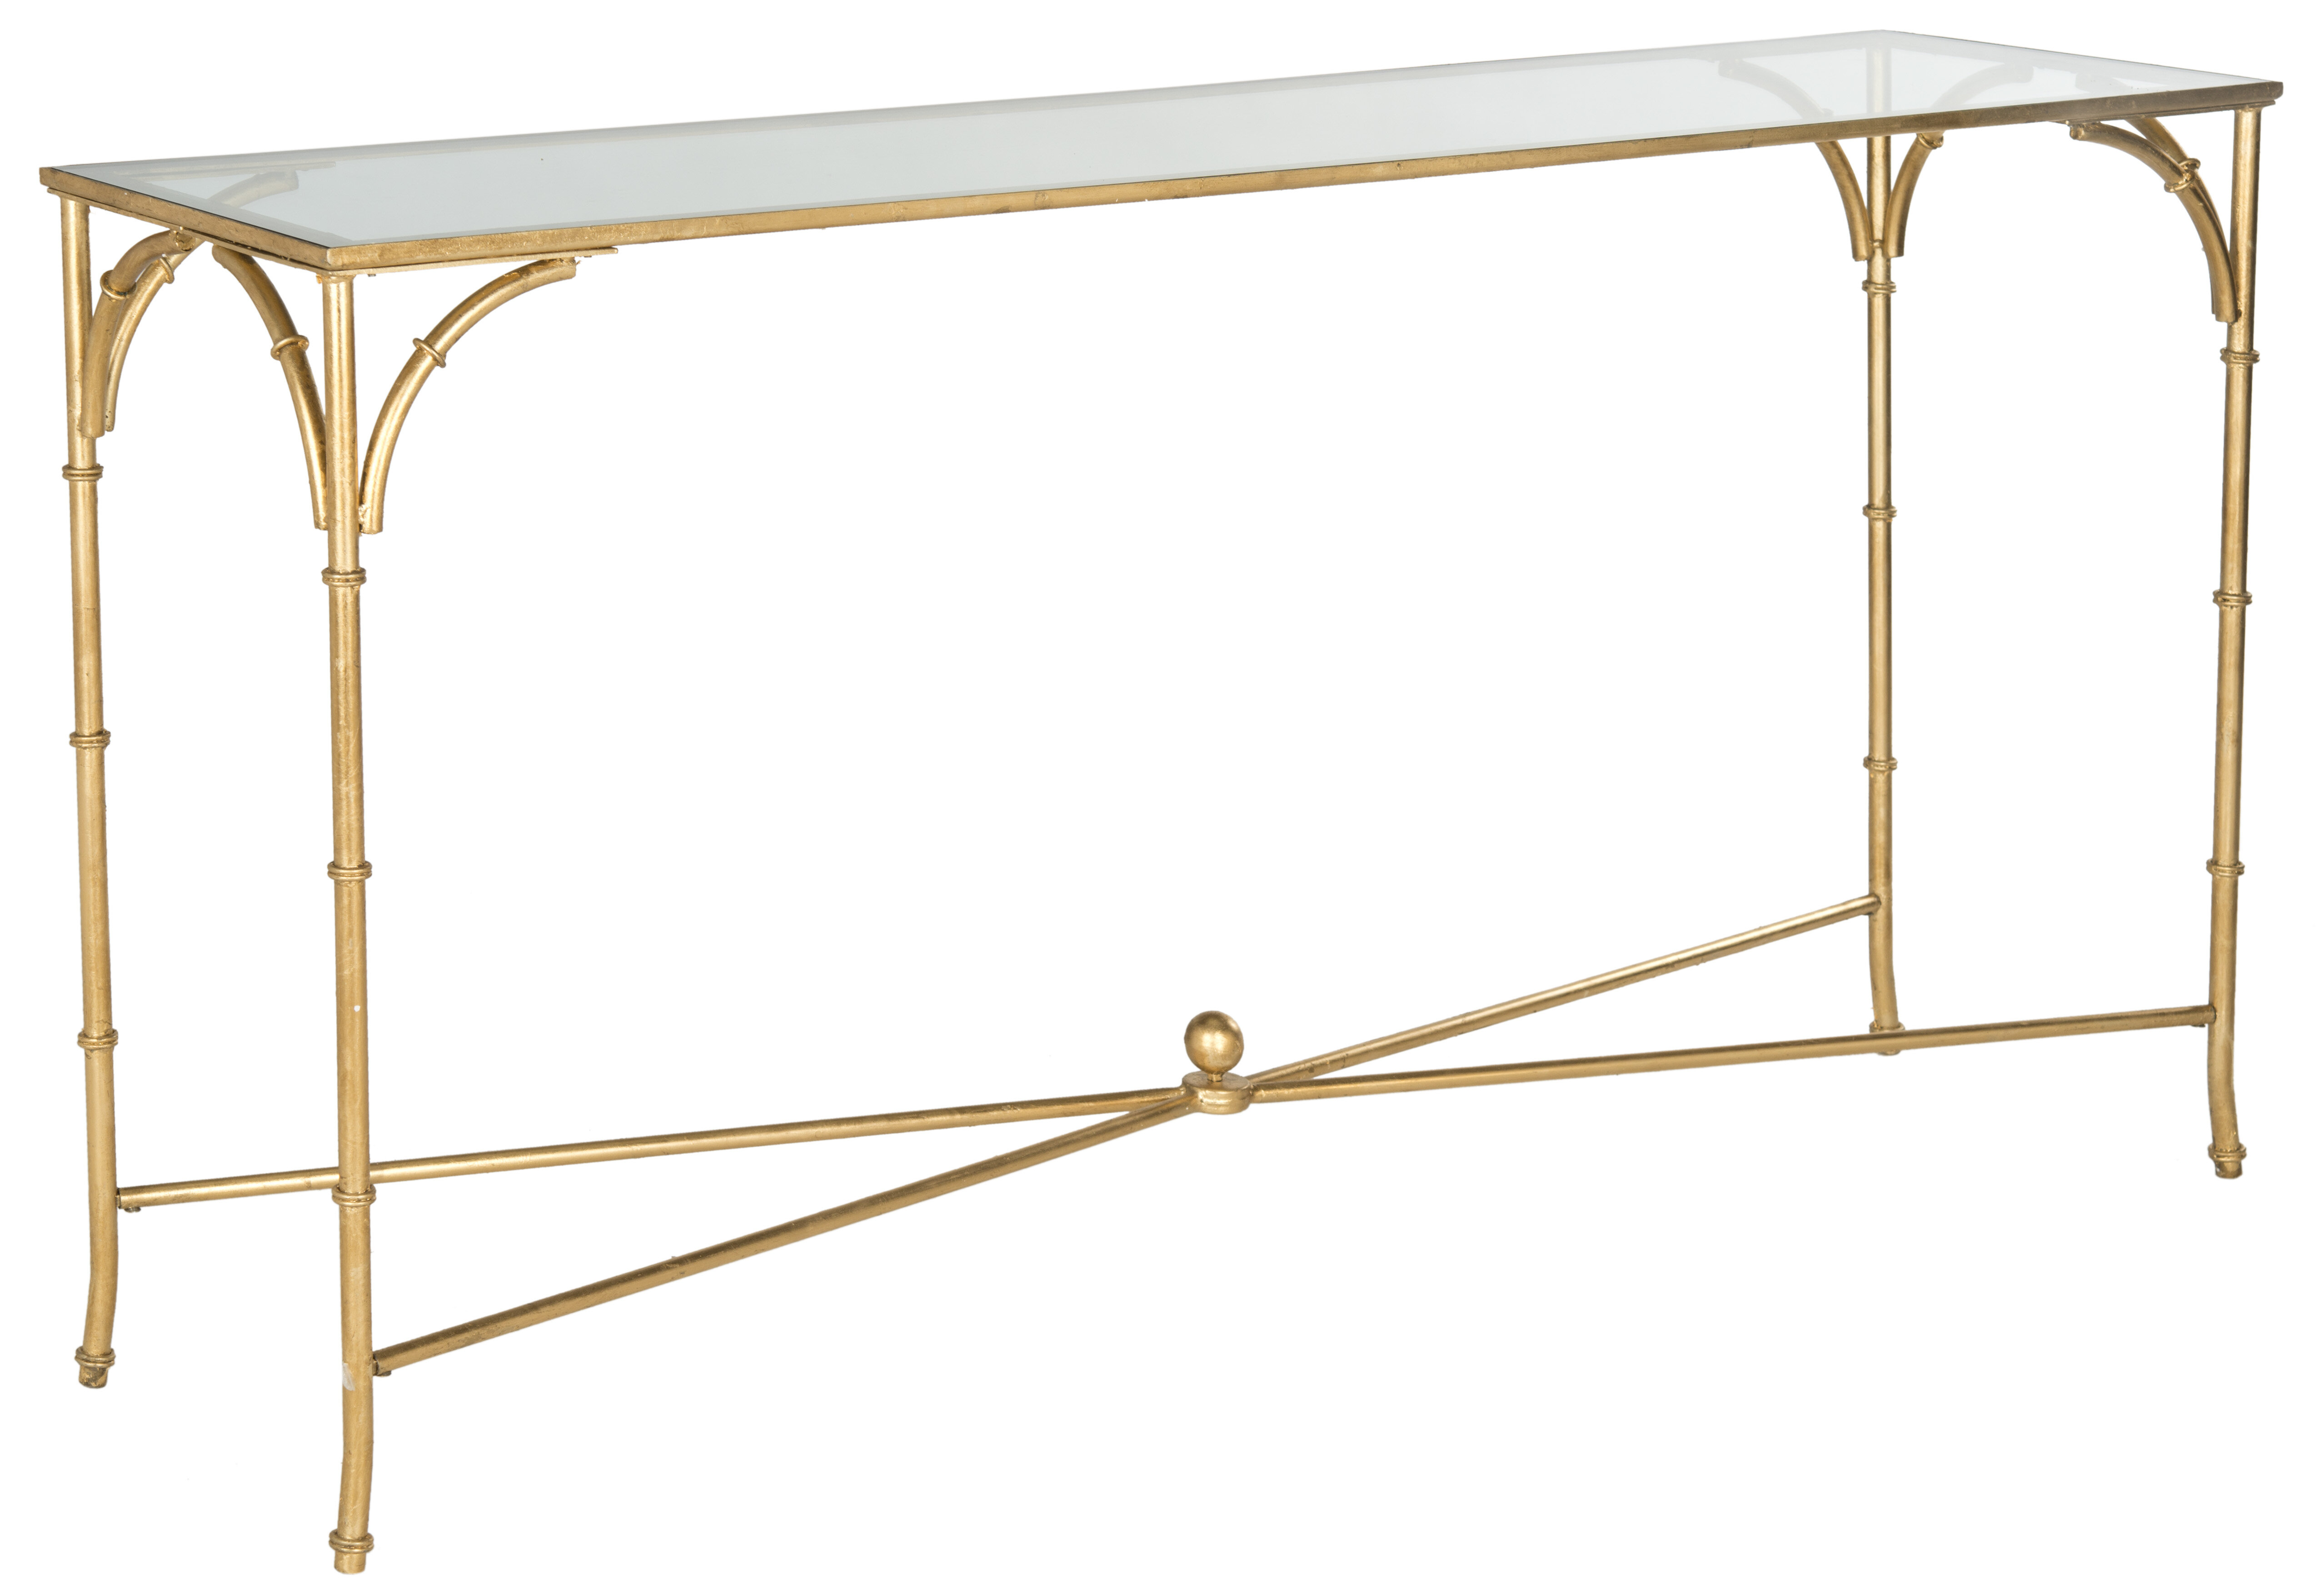 Incredible Spicer Console Table Inzonedesignstudio Interior Chair Design Inzonedesignstudiocom